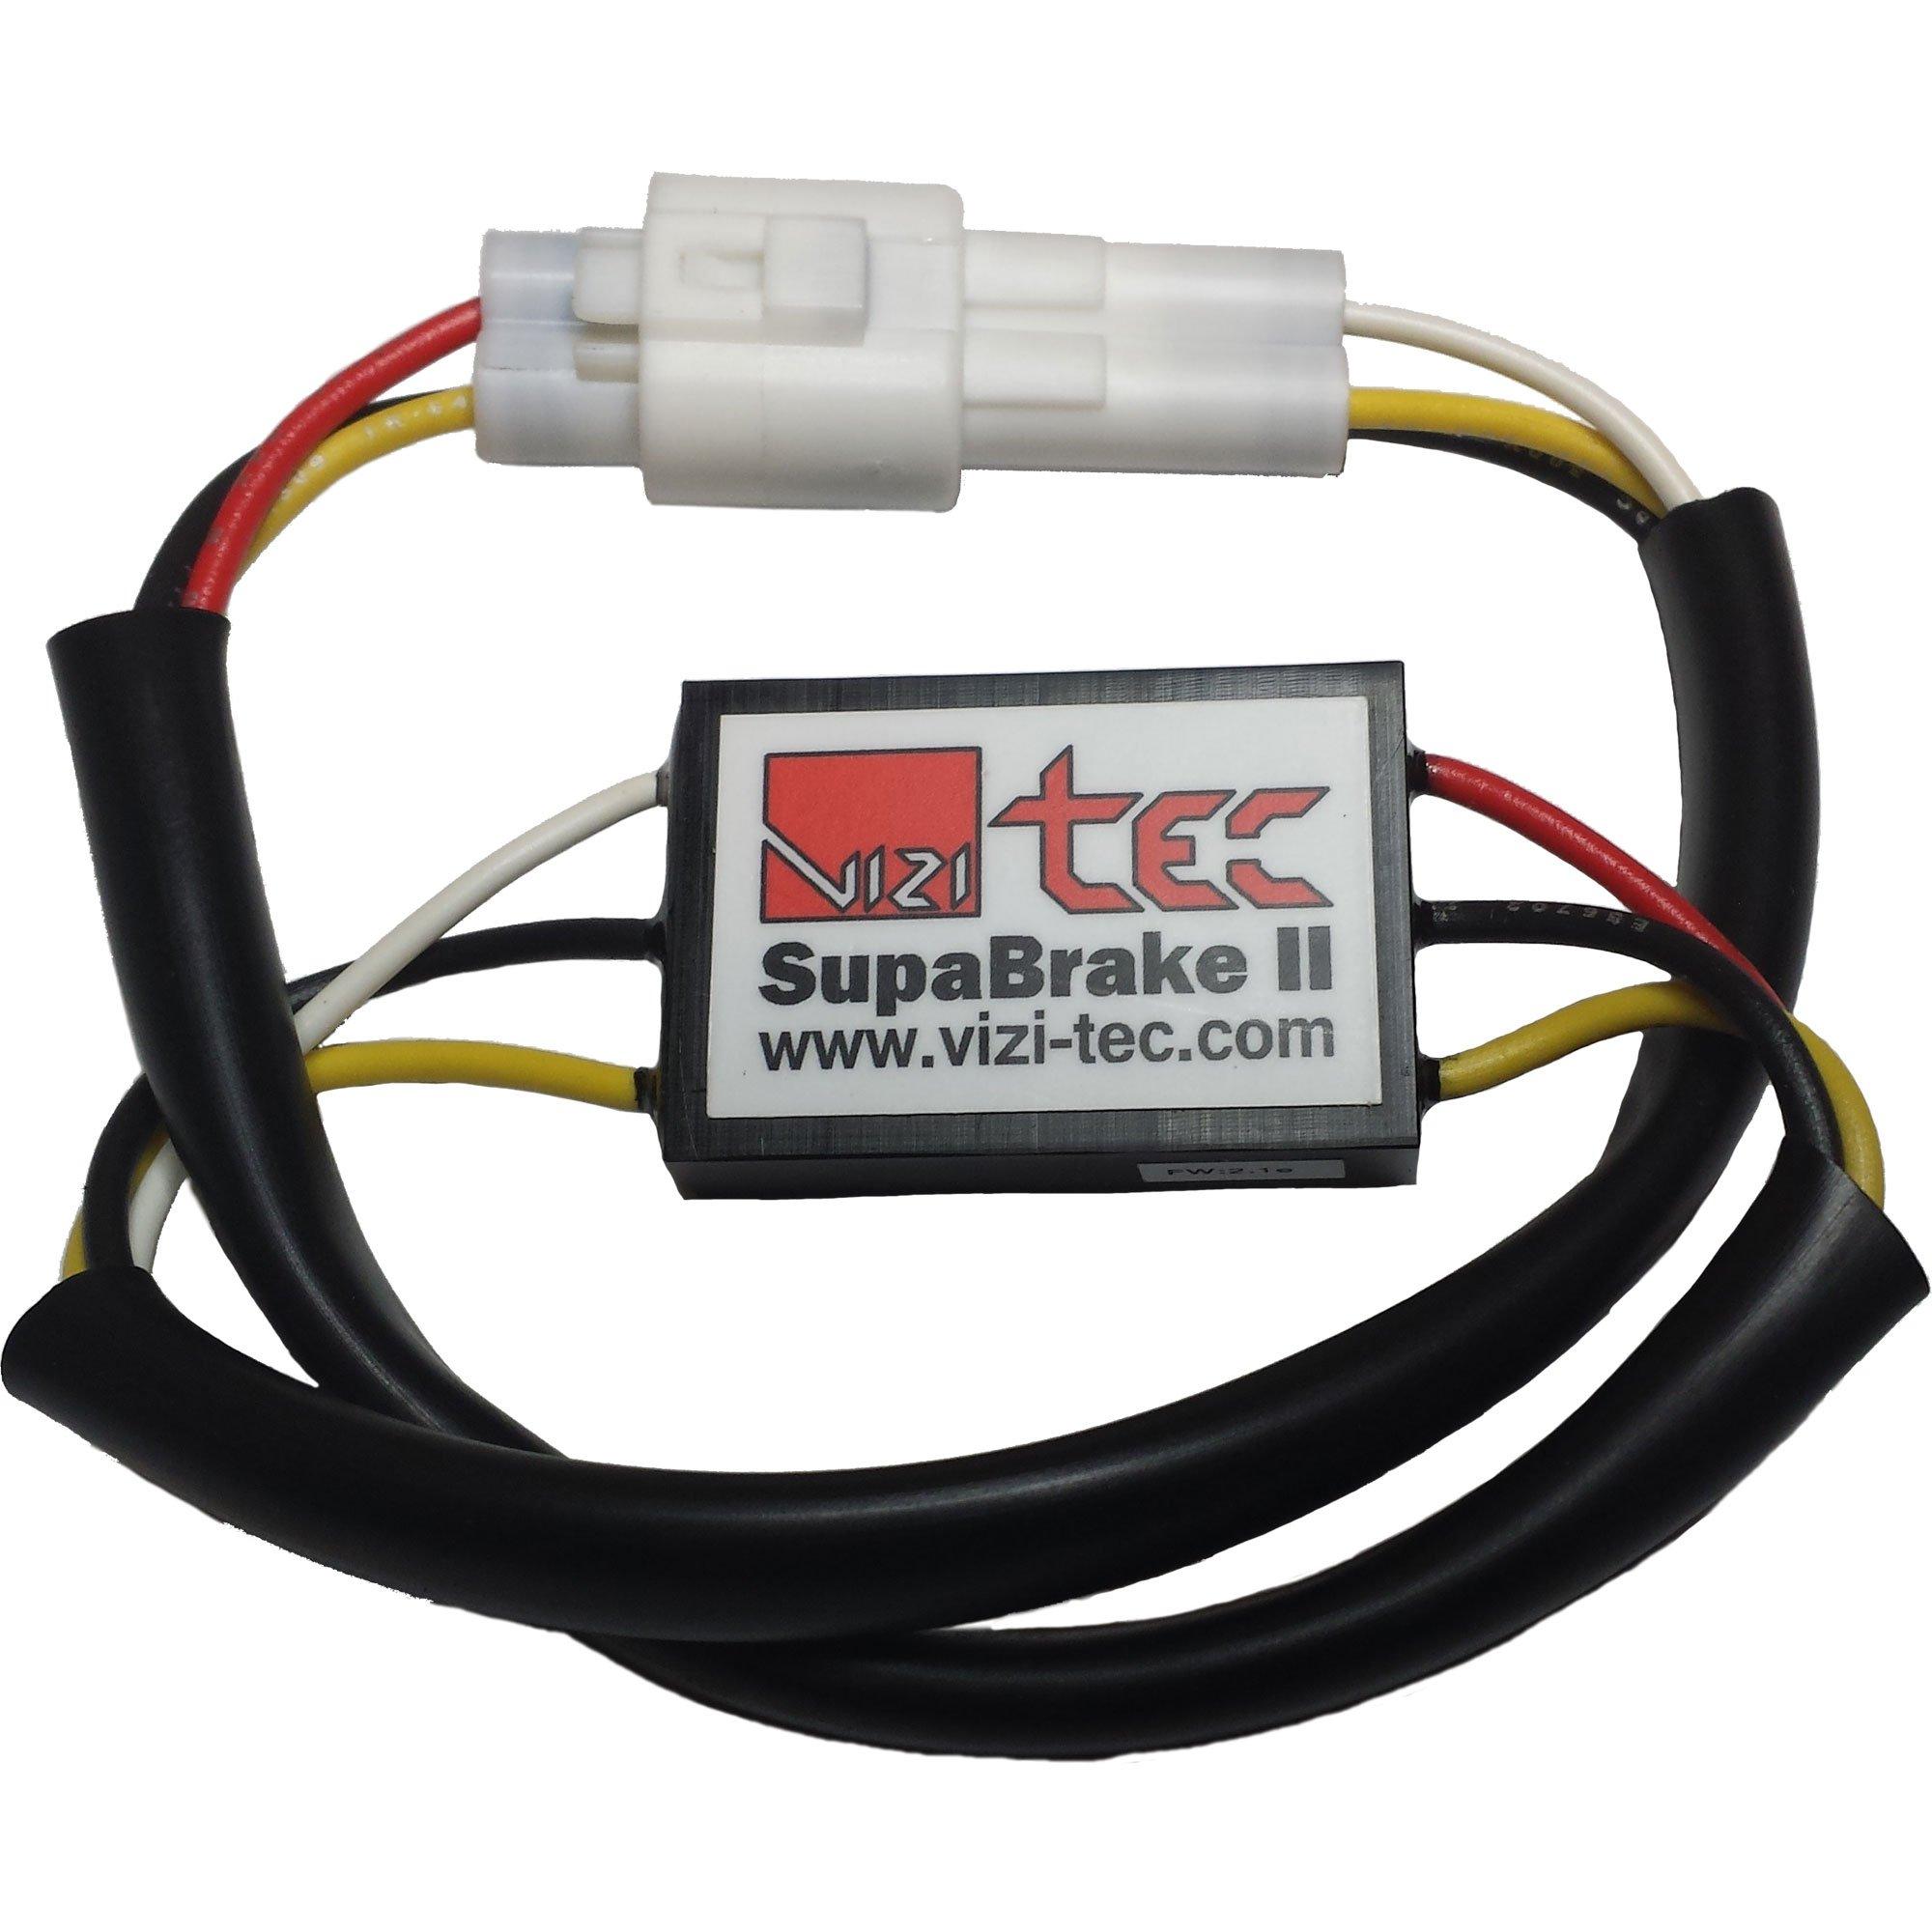 Vizi-Tec SupaBrake-II Brake Light Modulator - Ducati Supersport 750